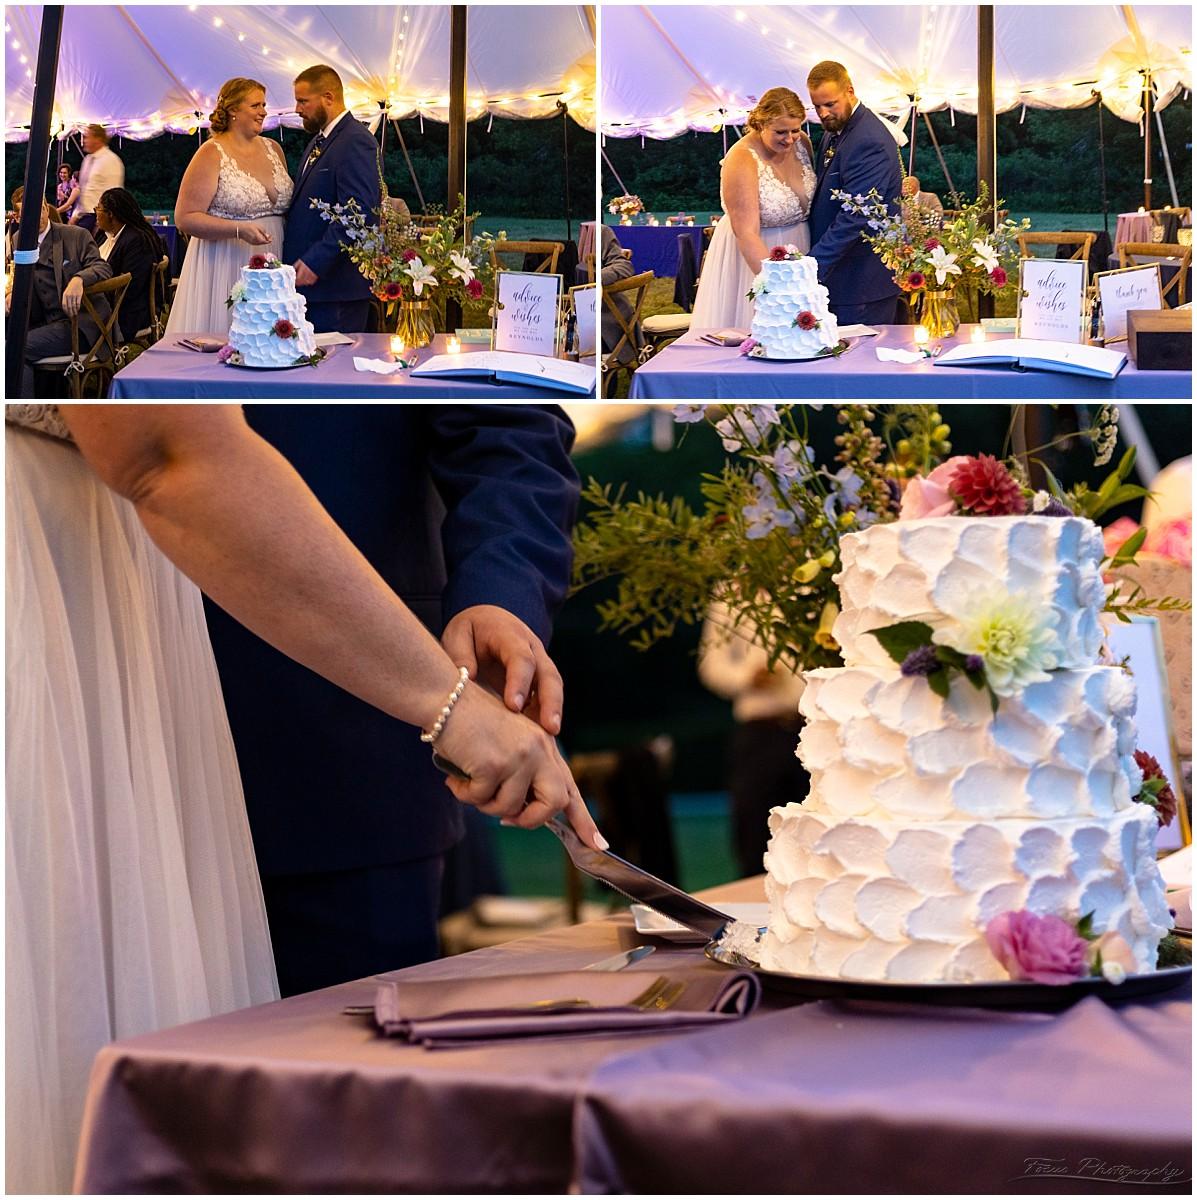 cutting the cake at backyard wedding reception in North Yarmouth